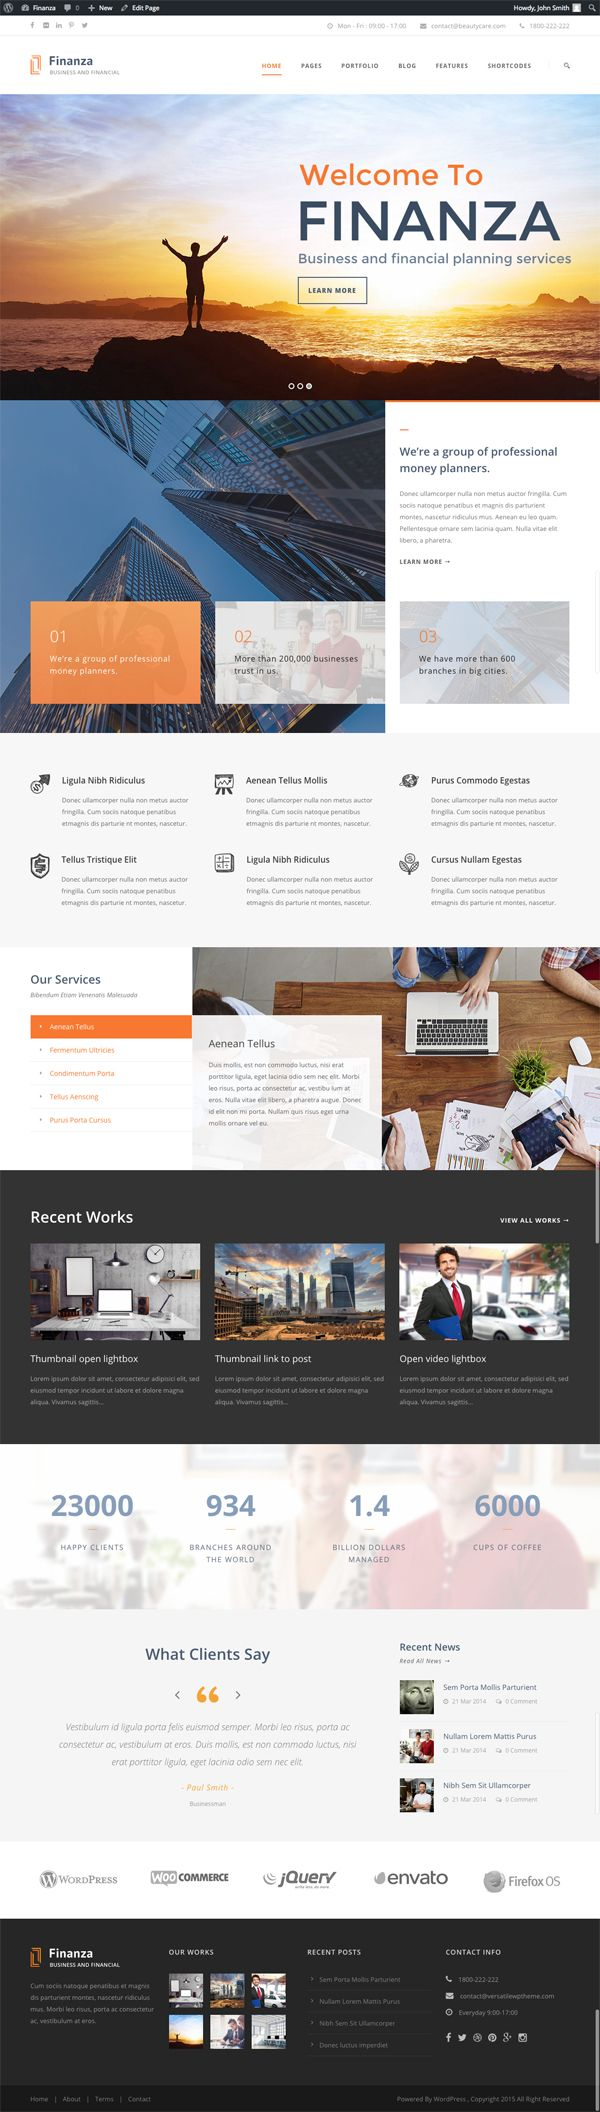 Finanza - Business & Financial WordPress Theme #responsivedesign #html5 #wordpressthemes #templates #bootstrap